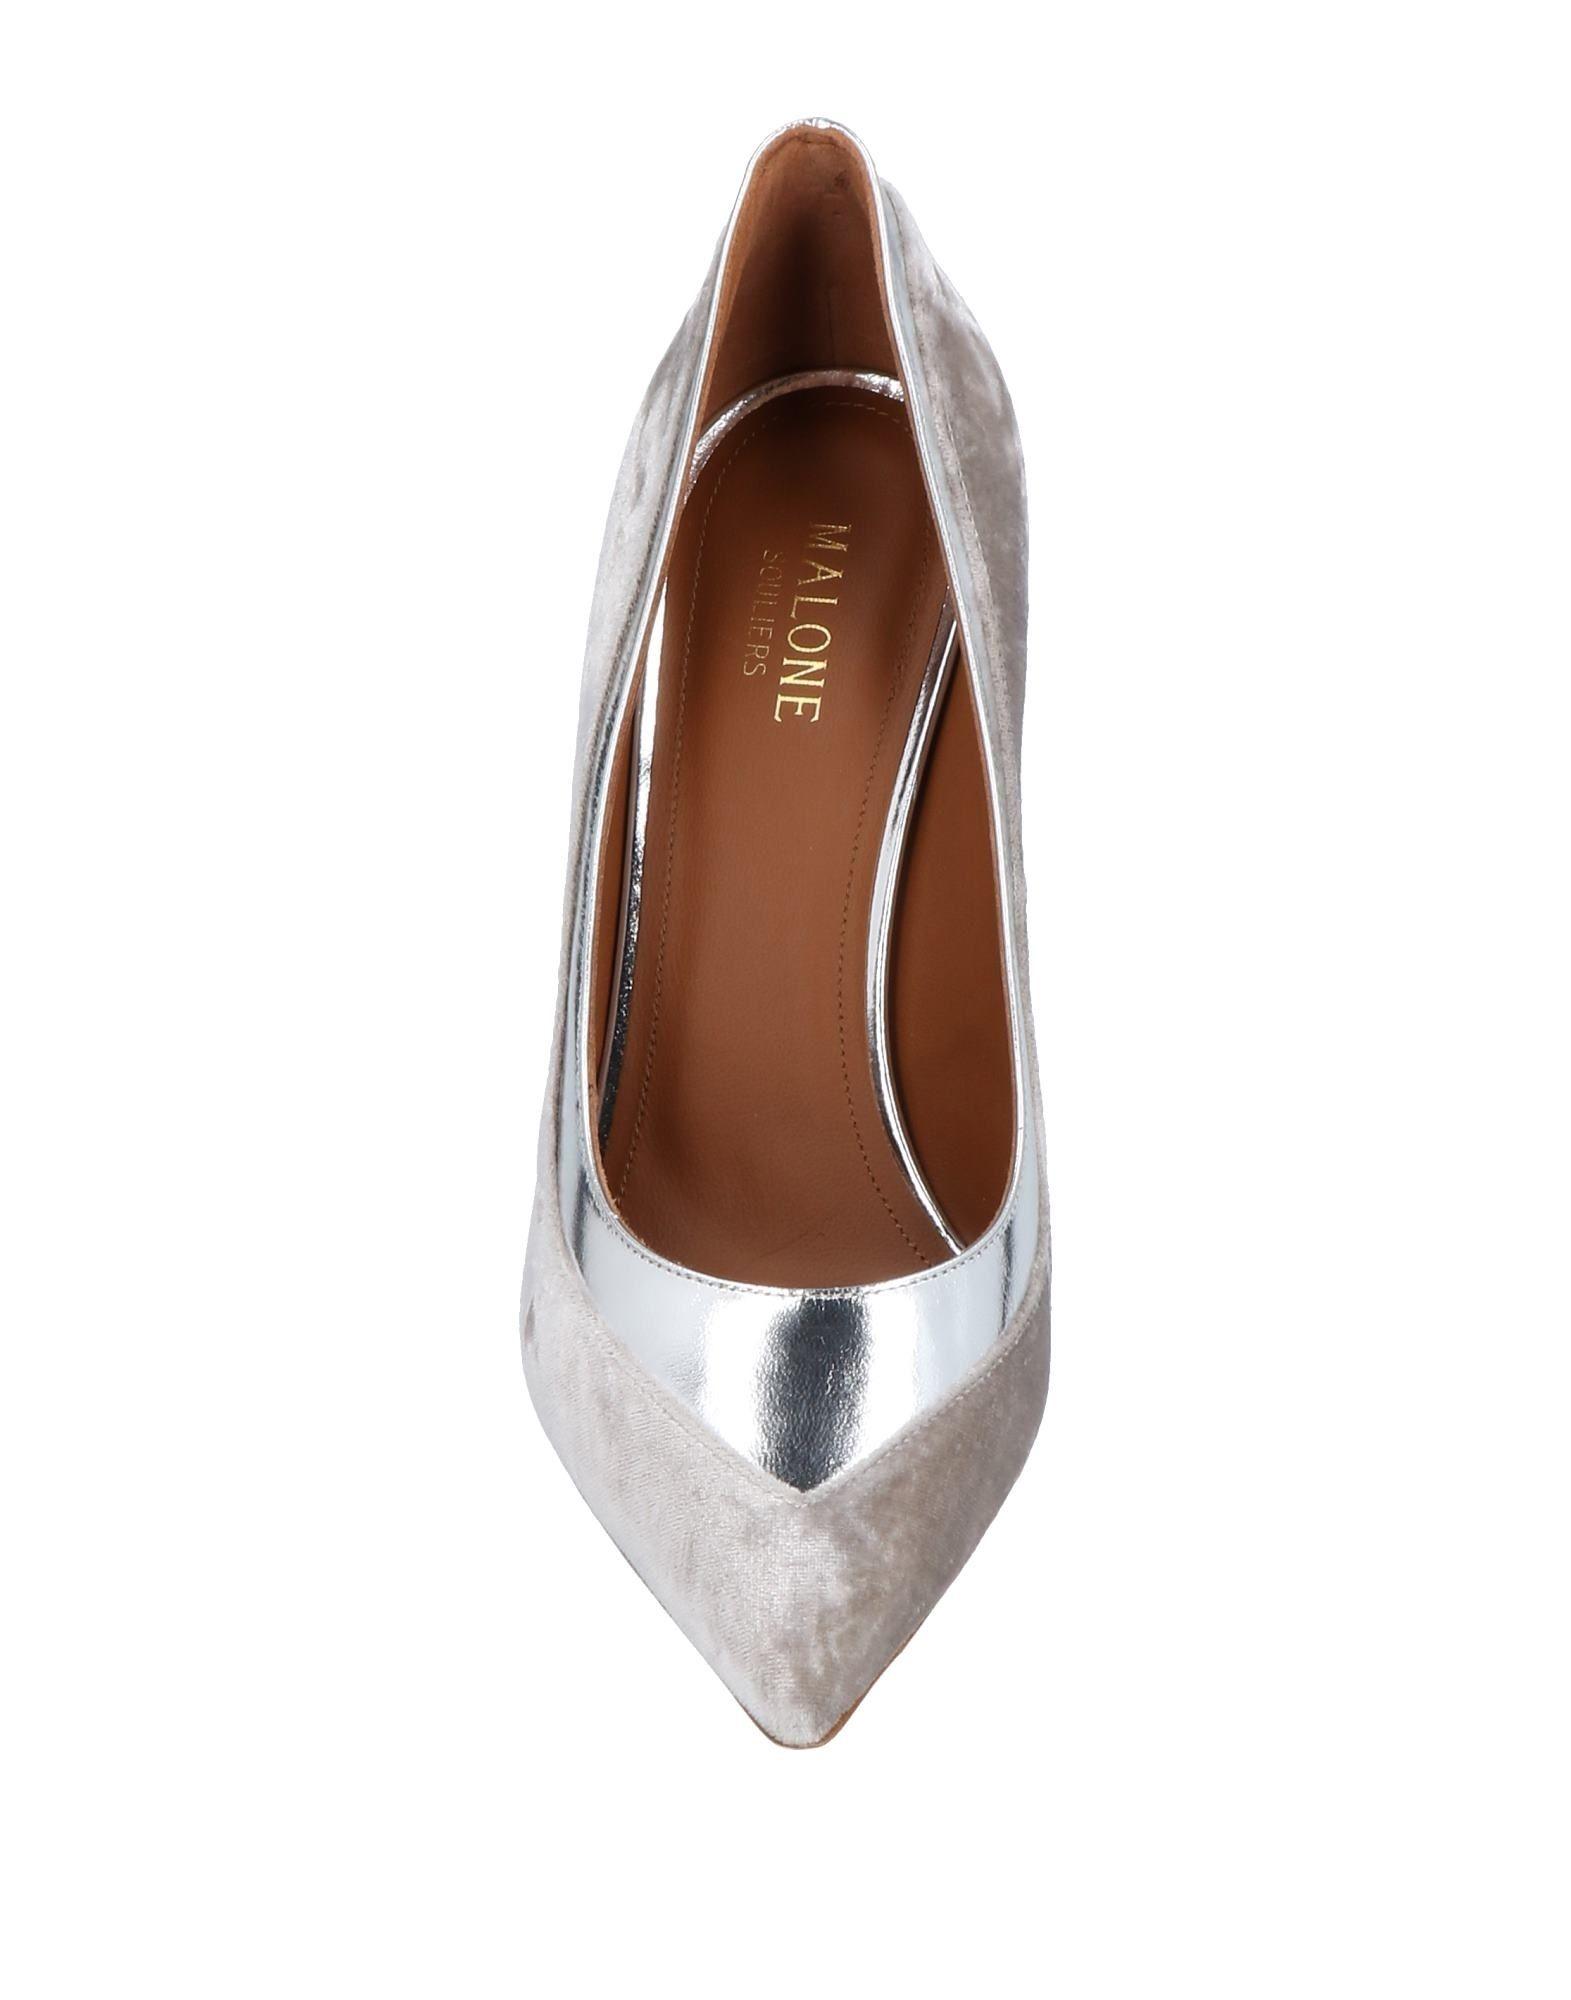 Malone 11482978LMGut Souliers Pumps Damen  11482978LMGut Malone aussehende strapazierfähige Schuhe 493819